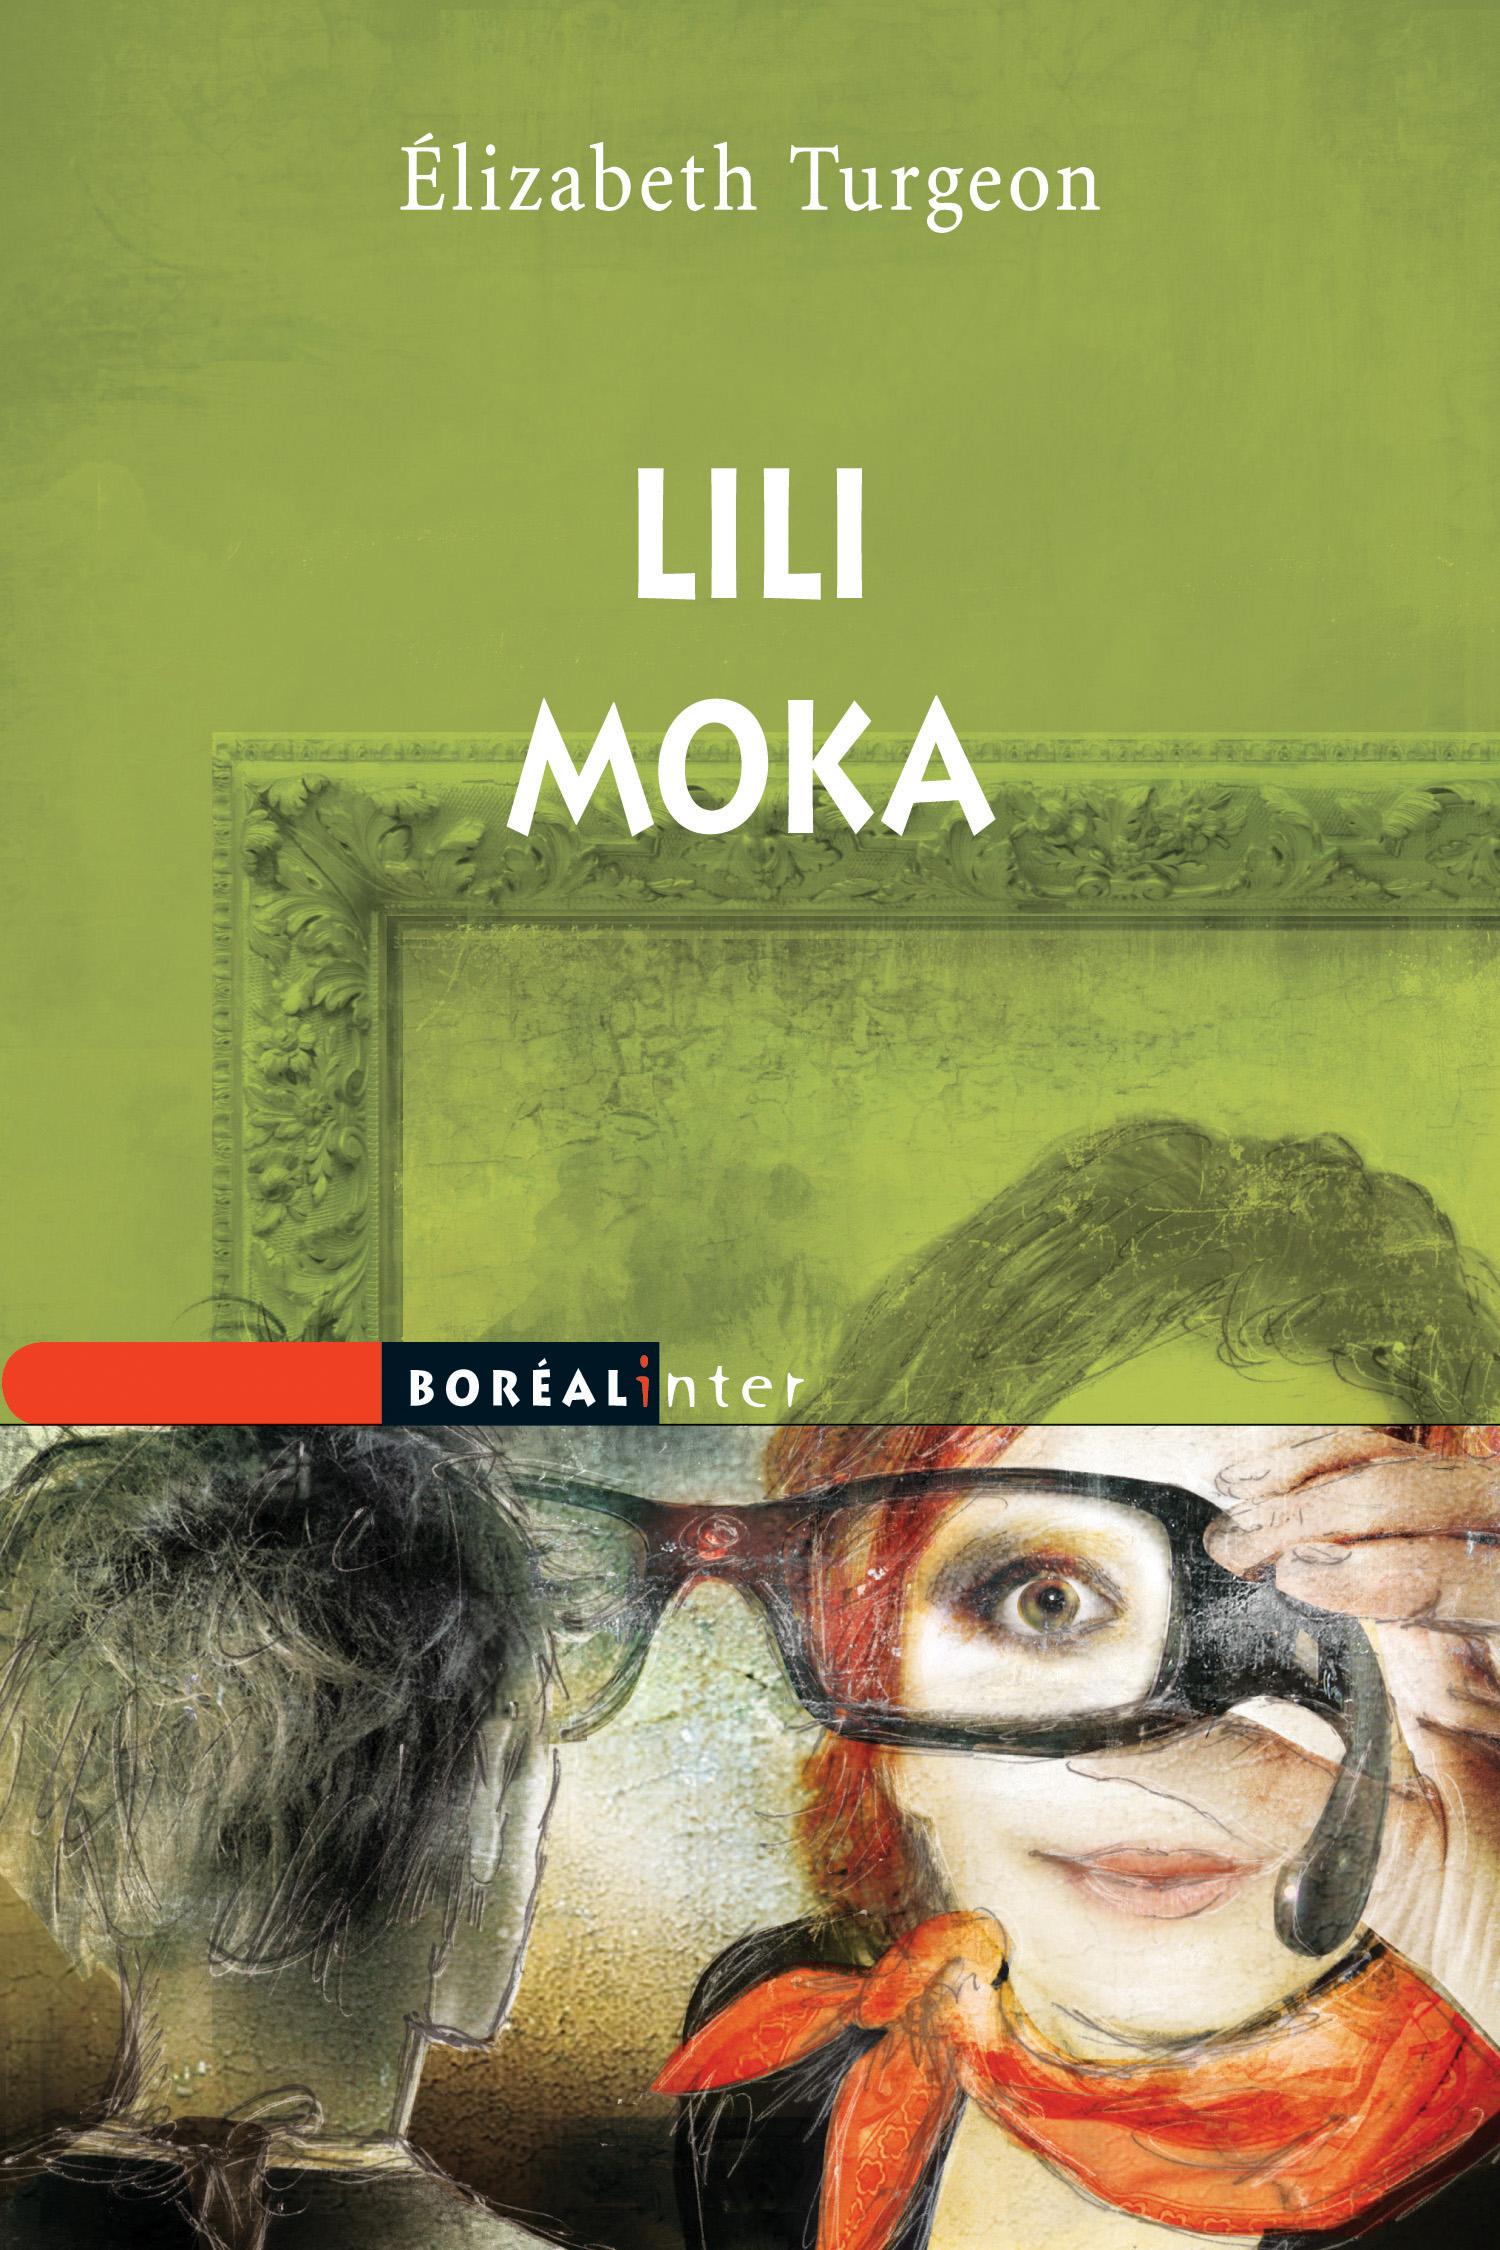 Couverture : Lili Moka Élizabeth Turgeon